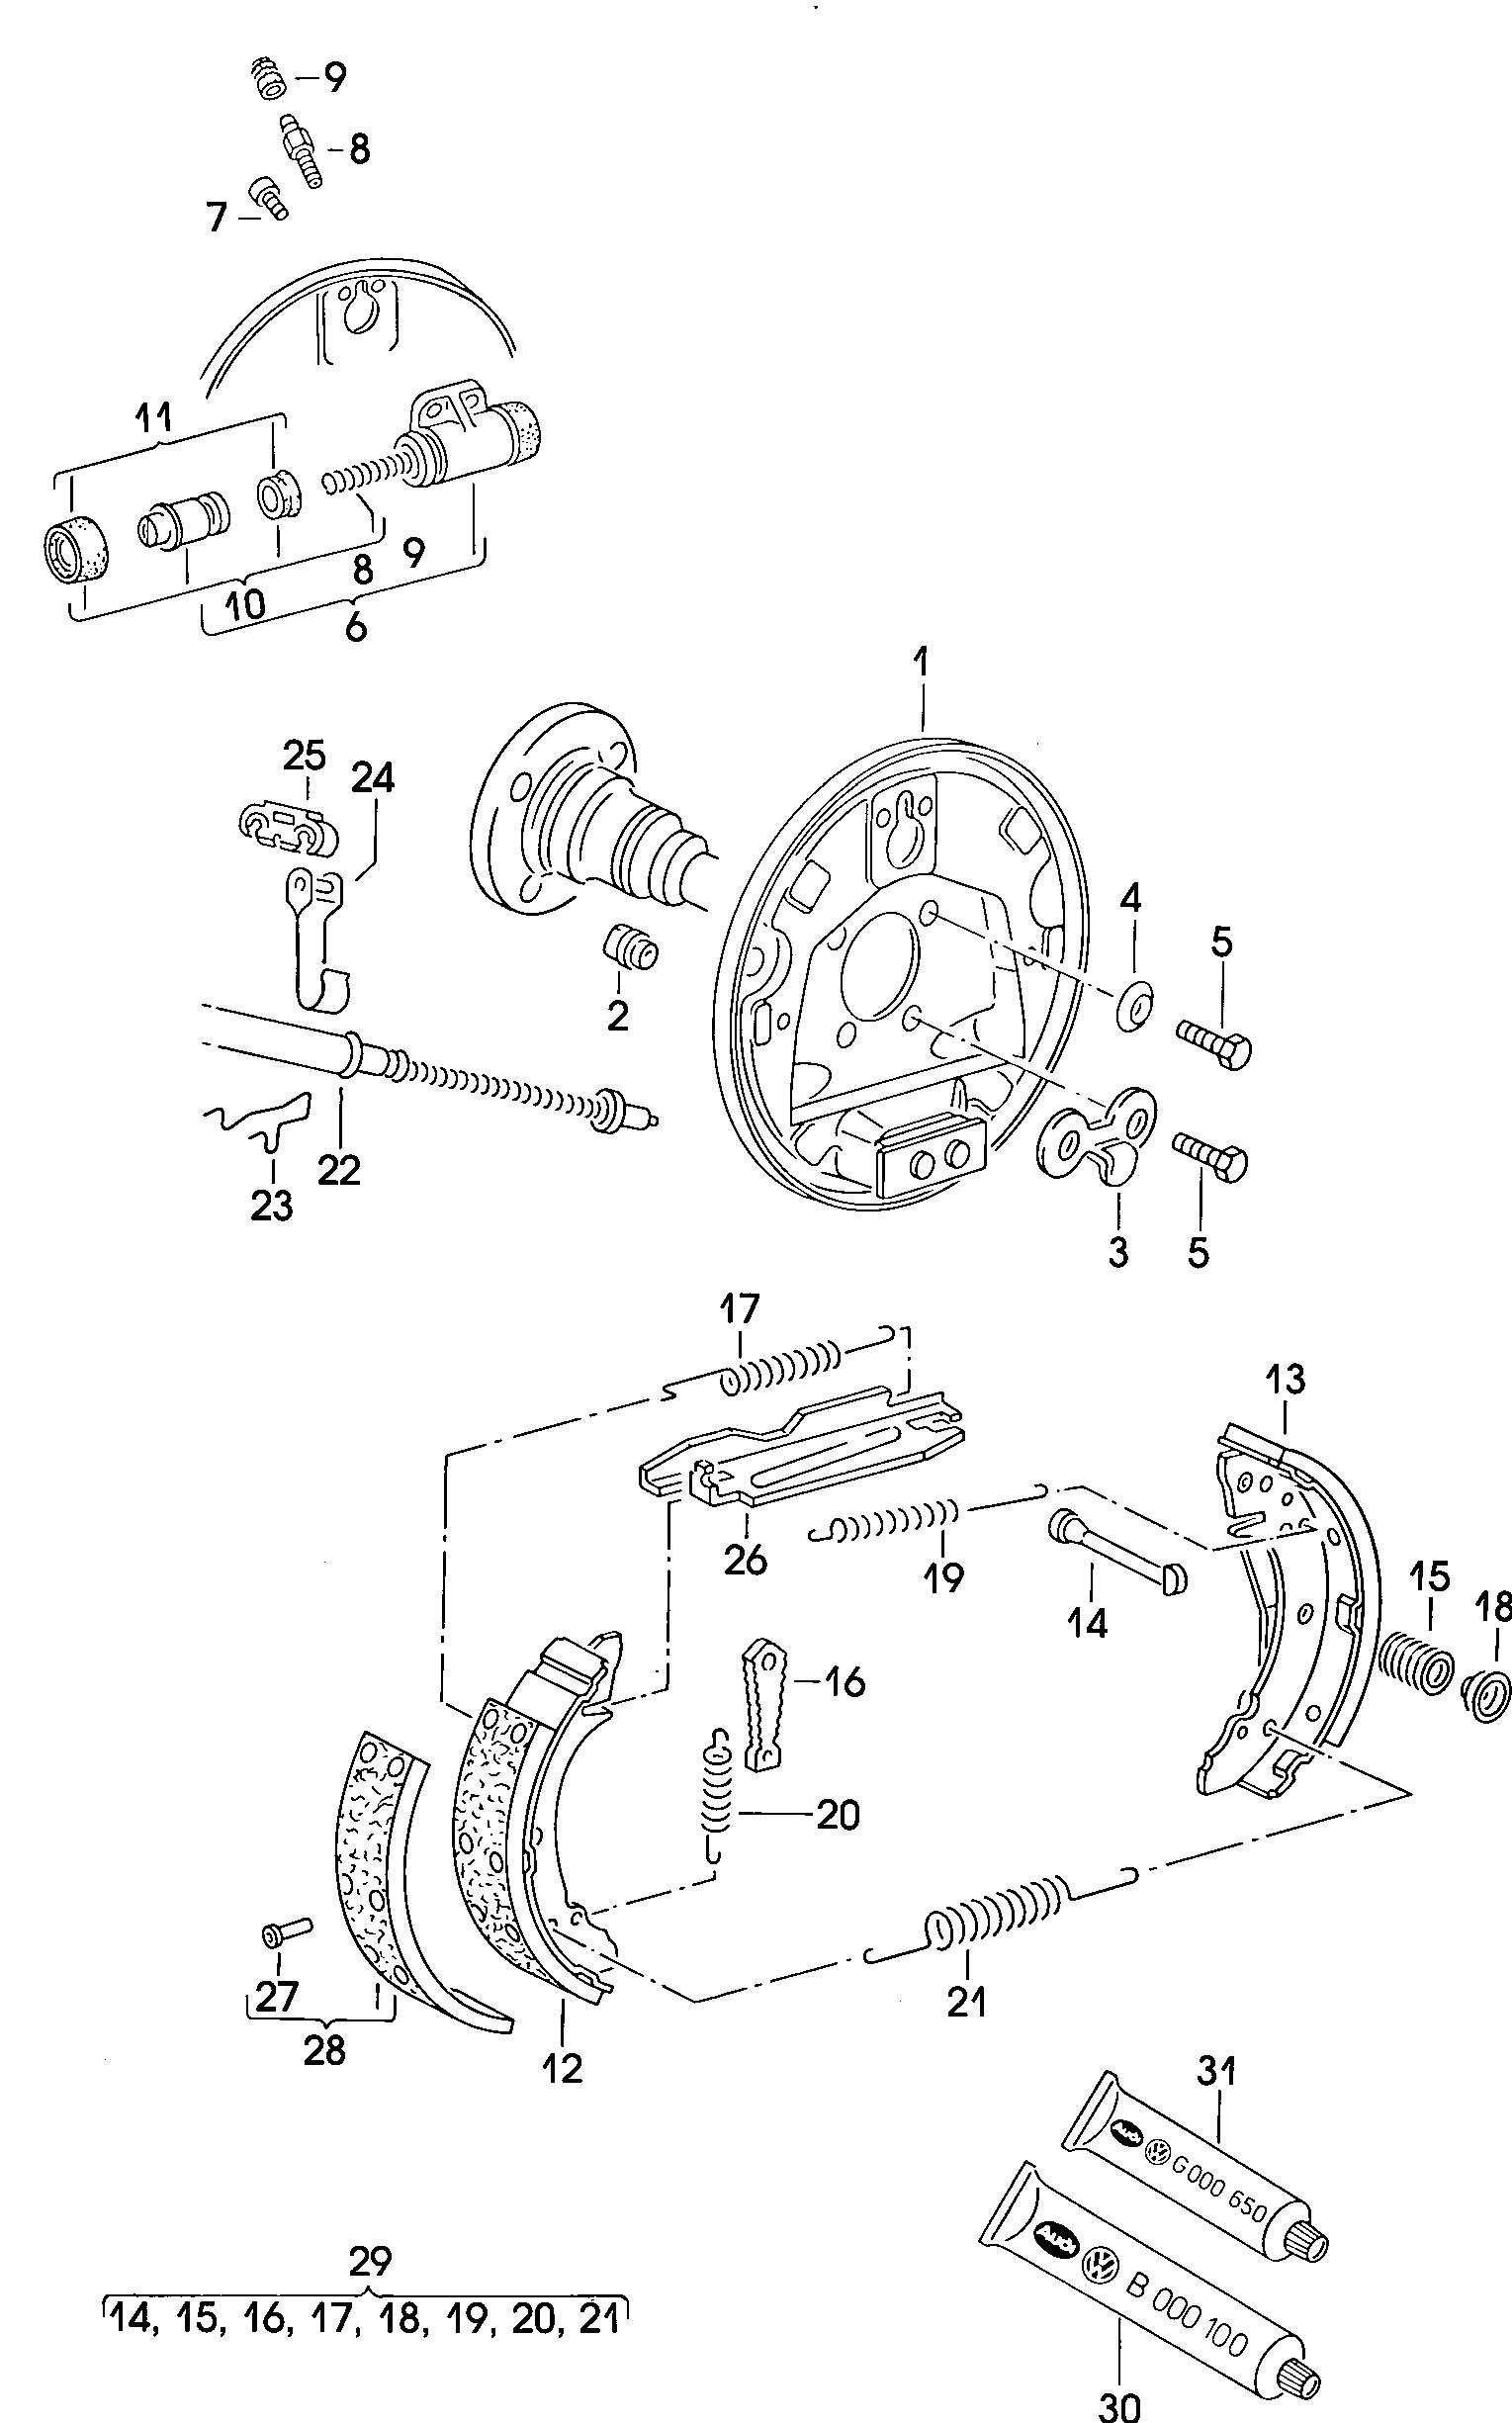 1990 Volkswagen Golf Drum brakes back plate wheel brake